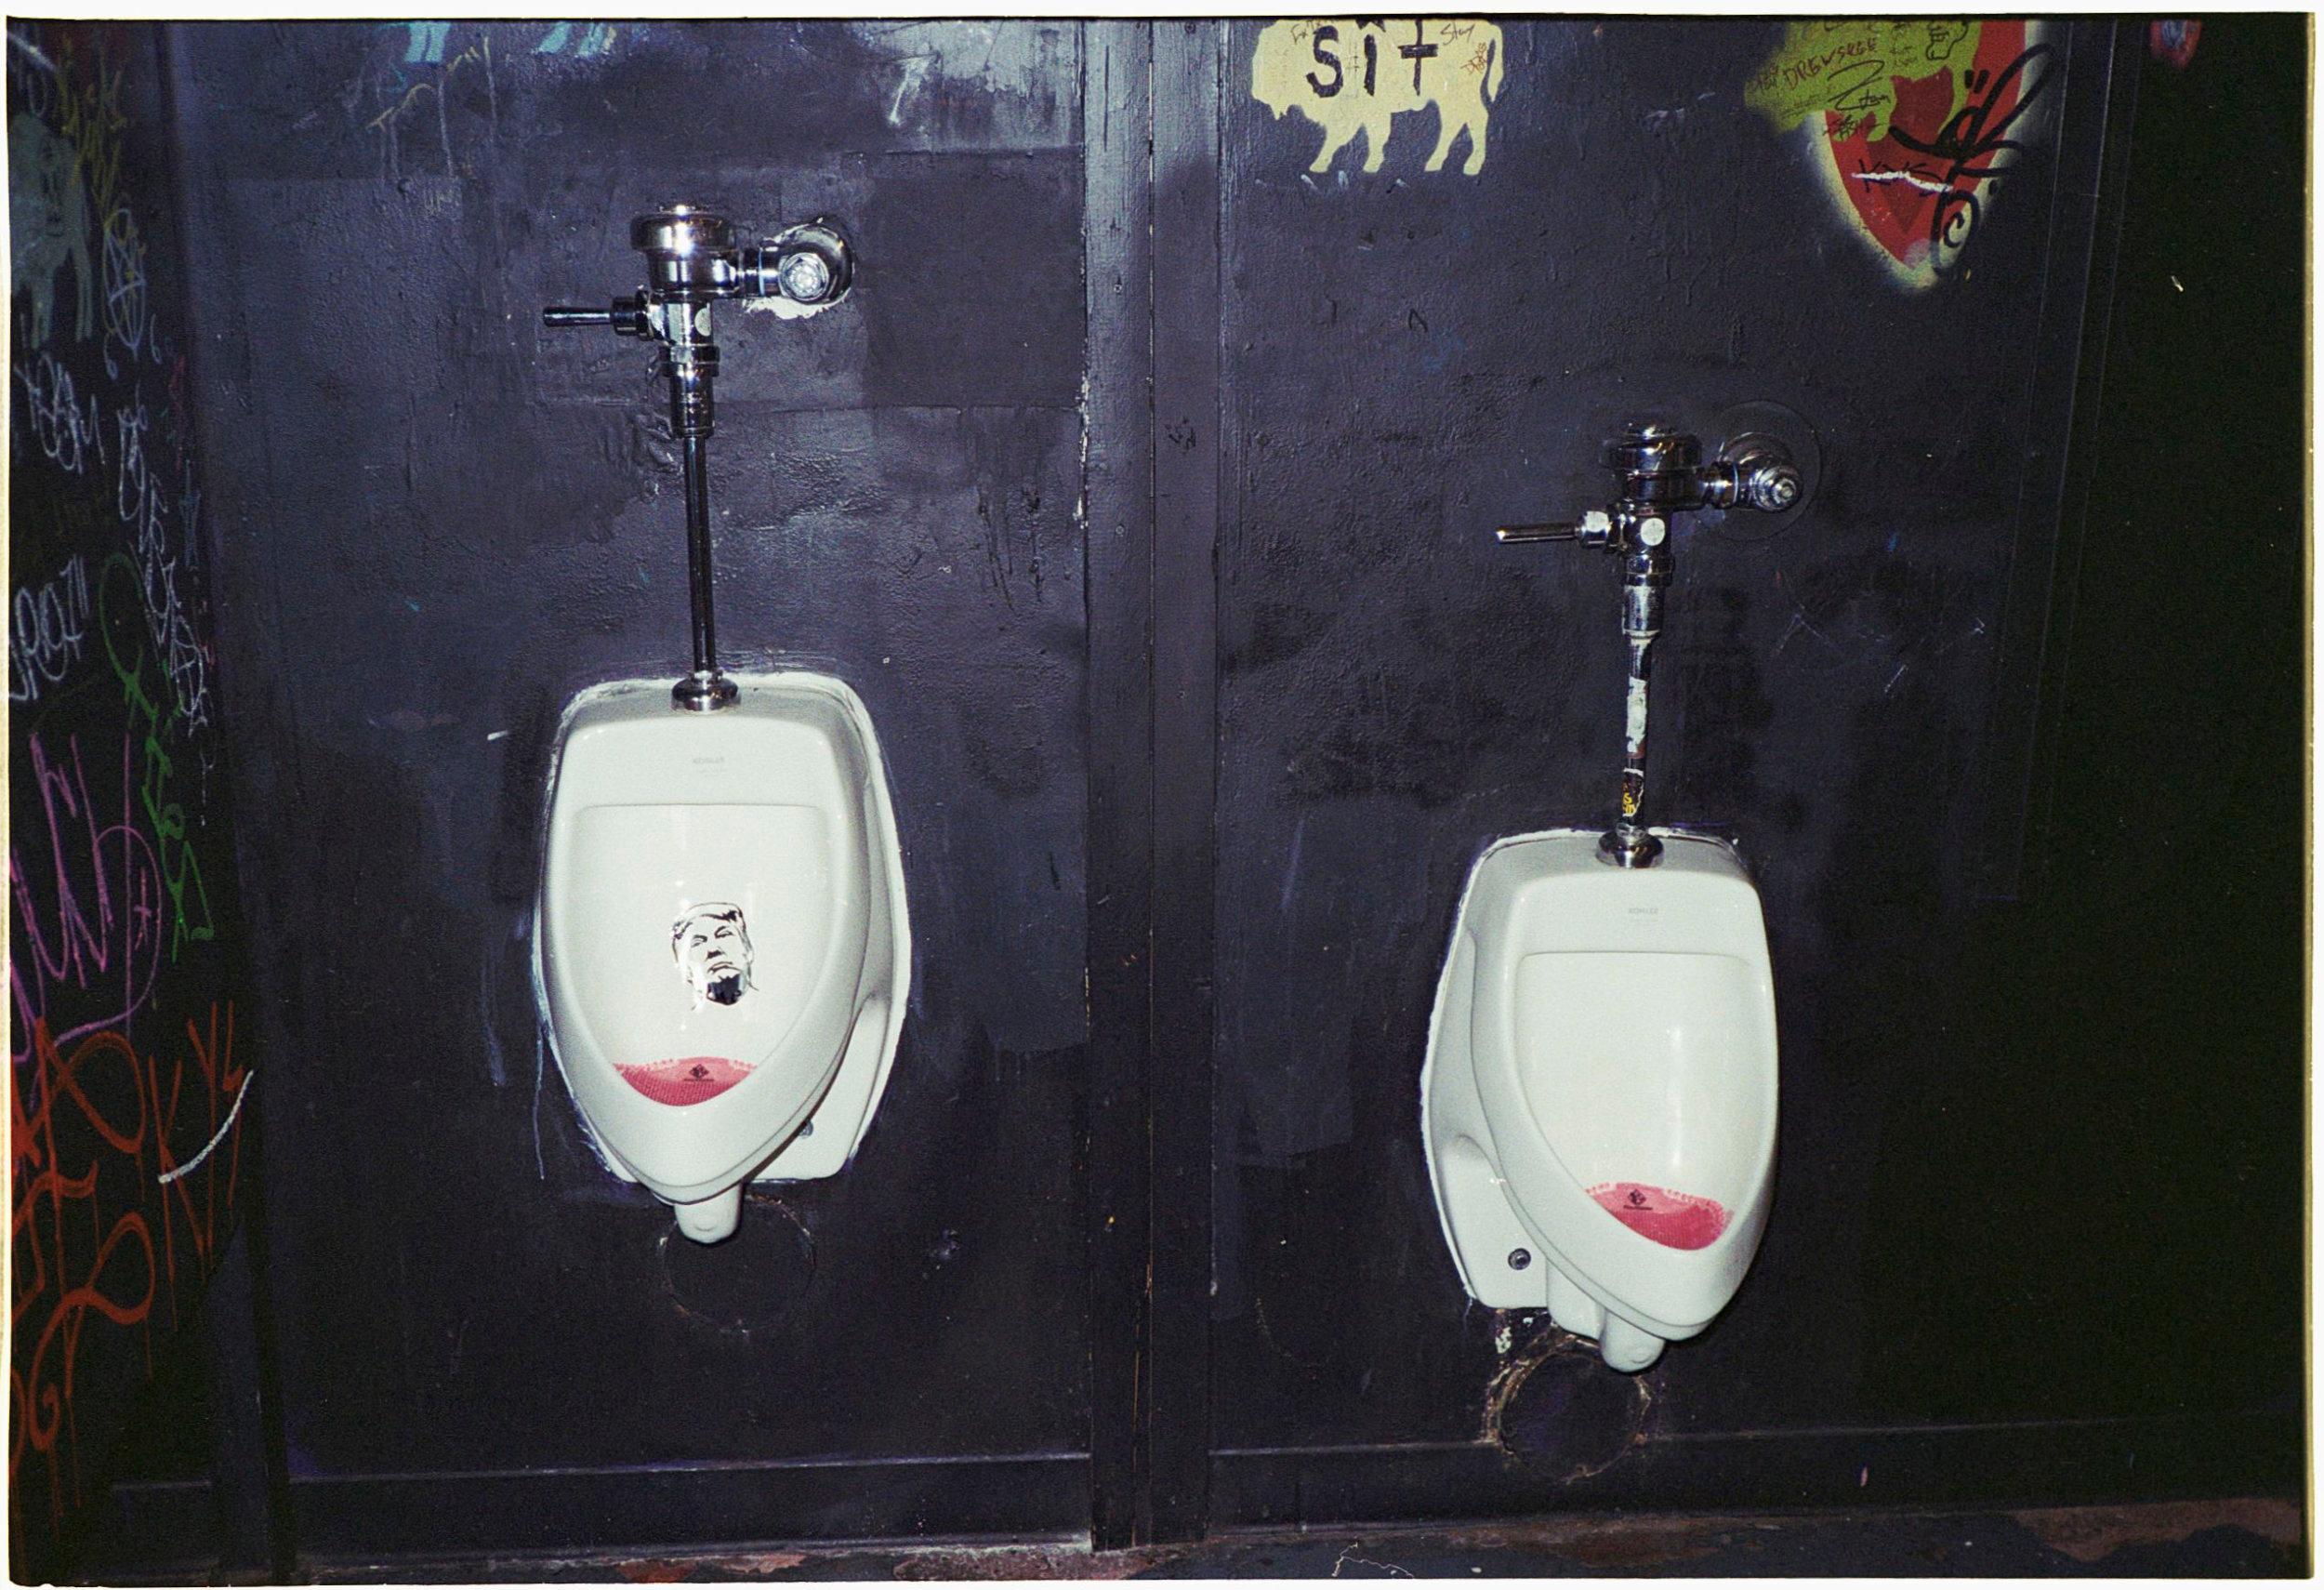 pee-head.jpg